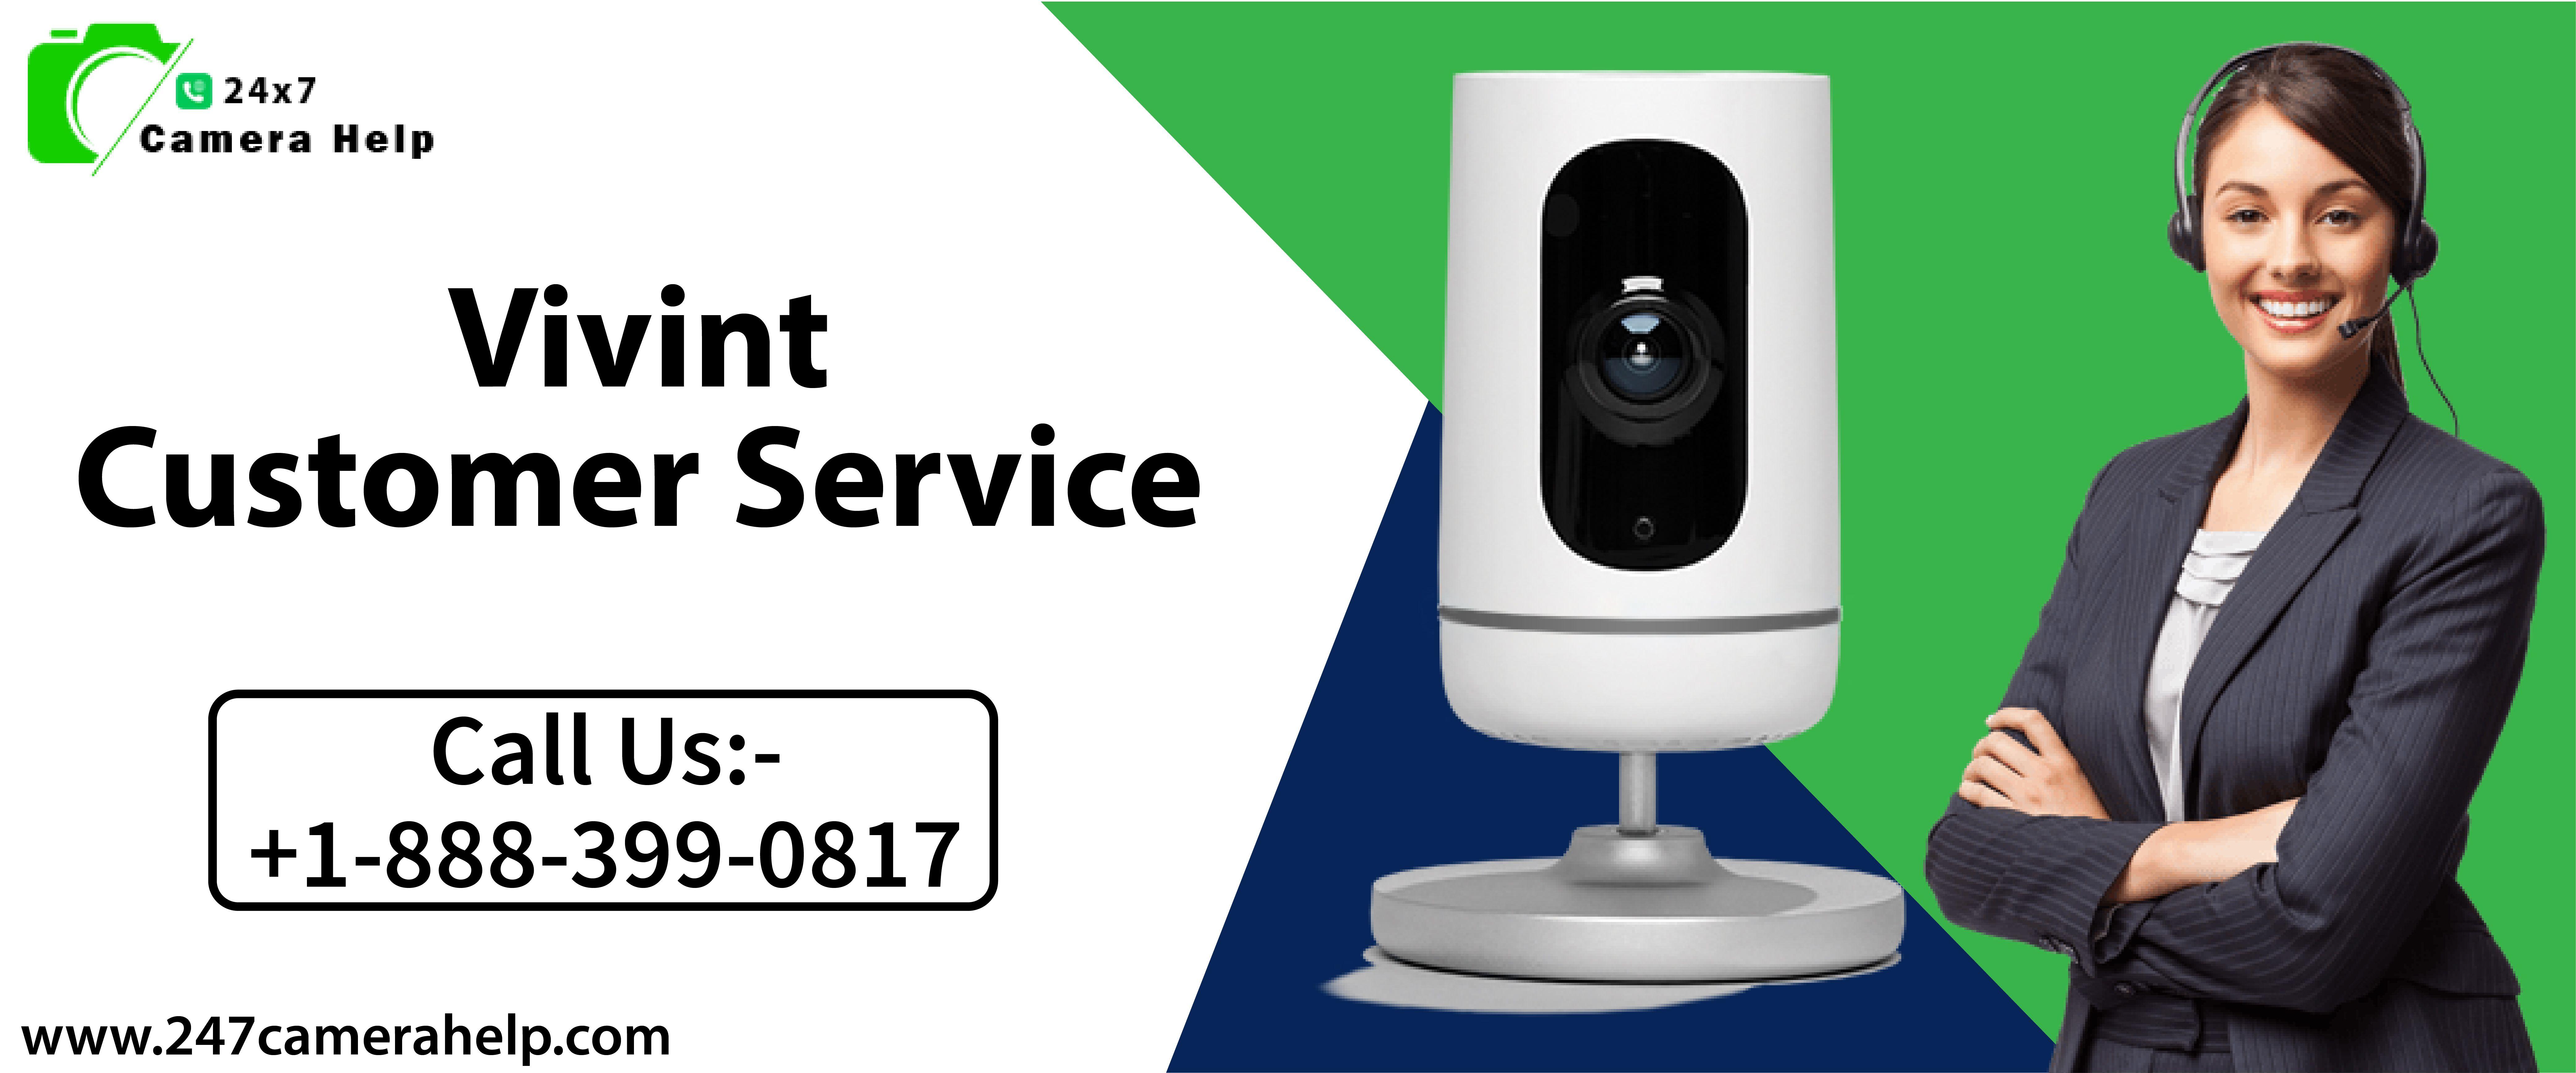 Vivint Customer Service Vivint Home Security Customer Service